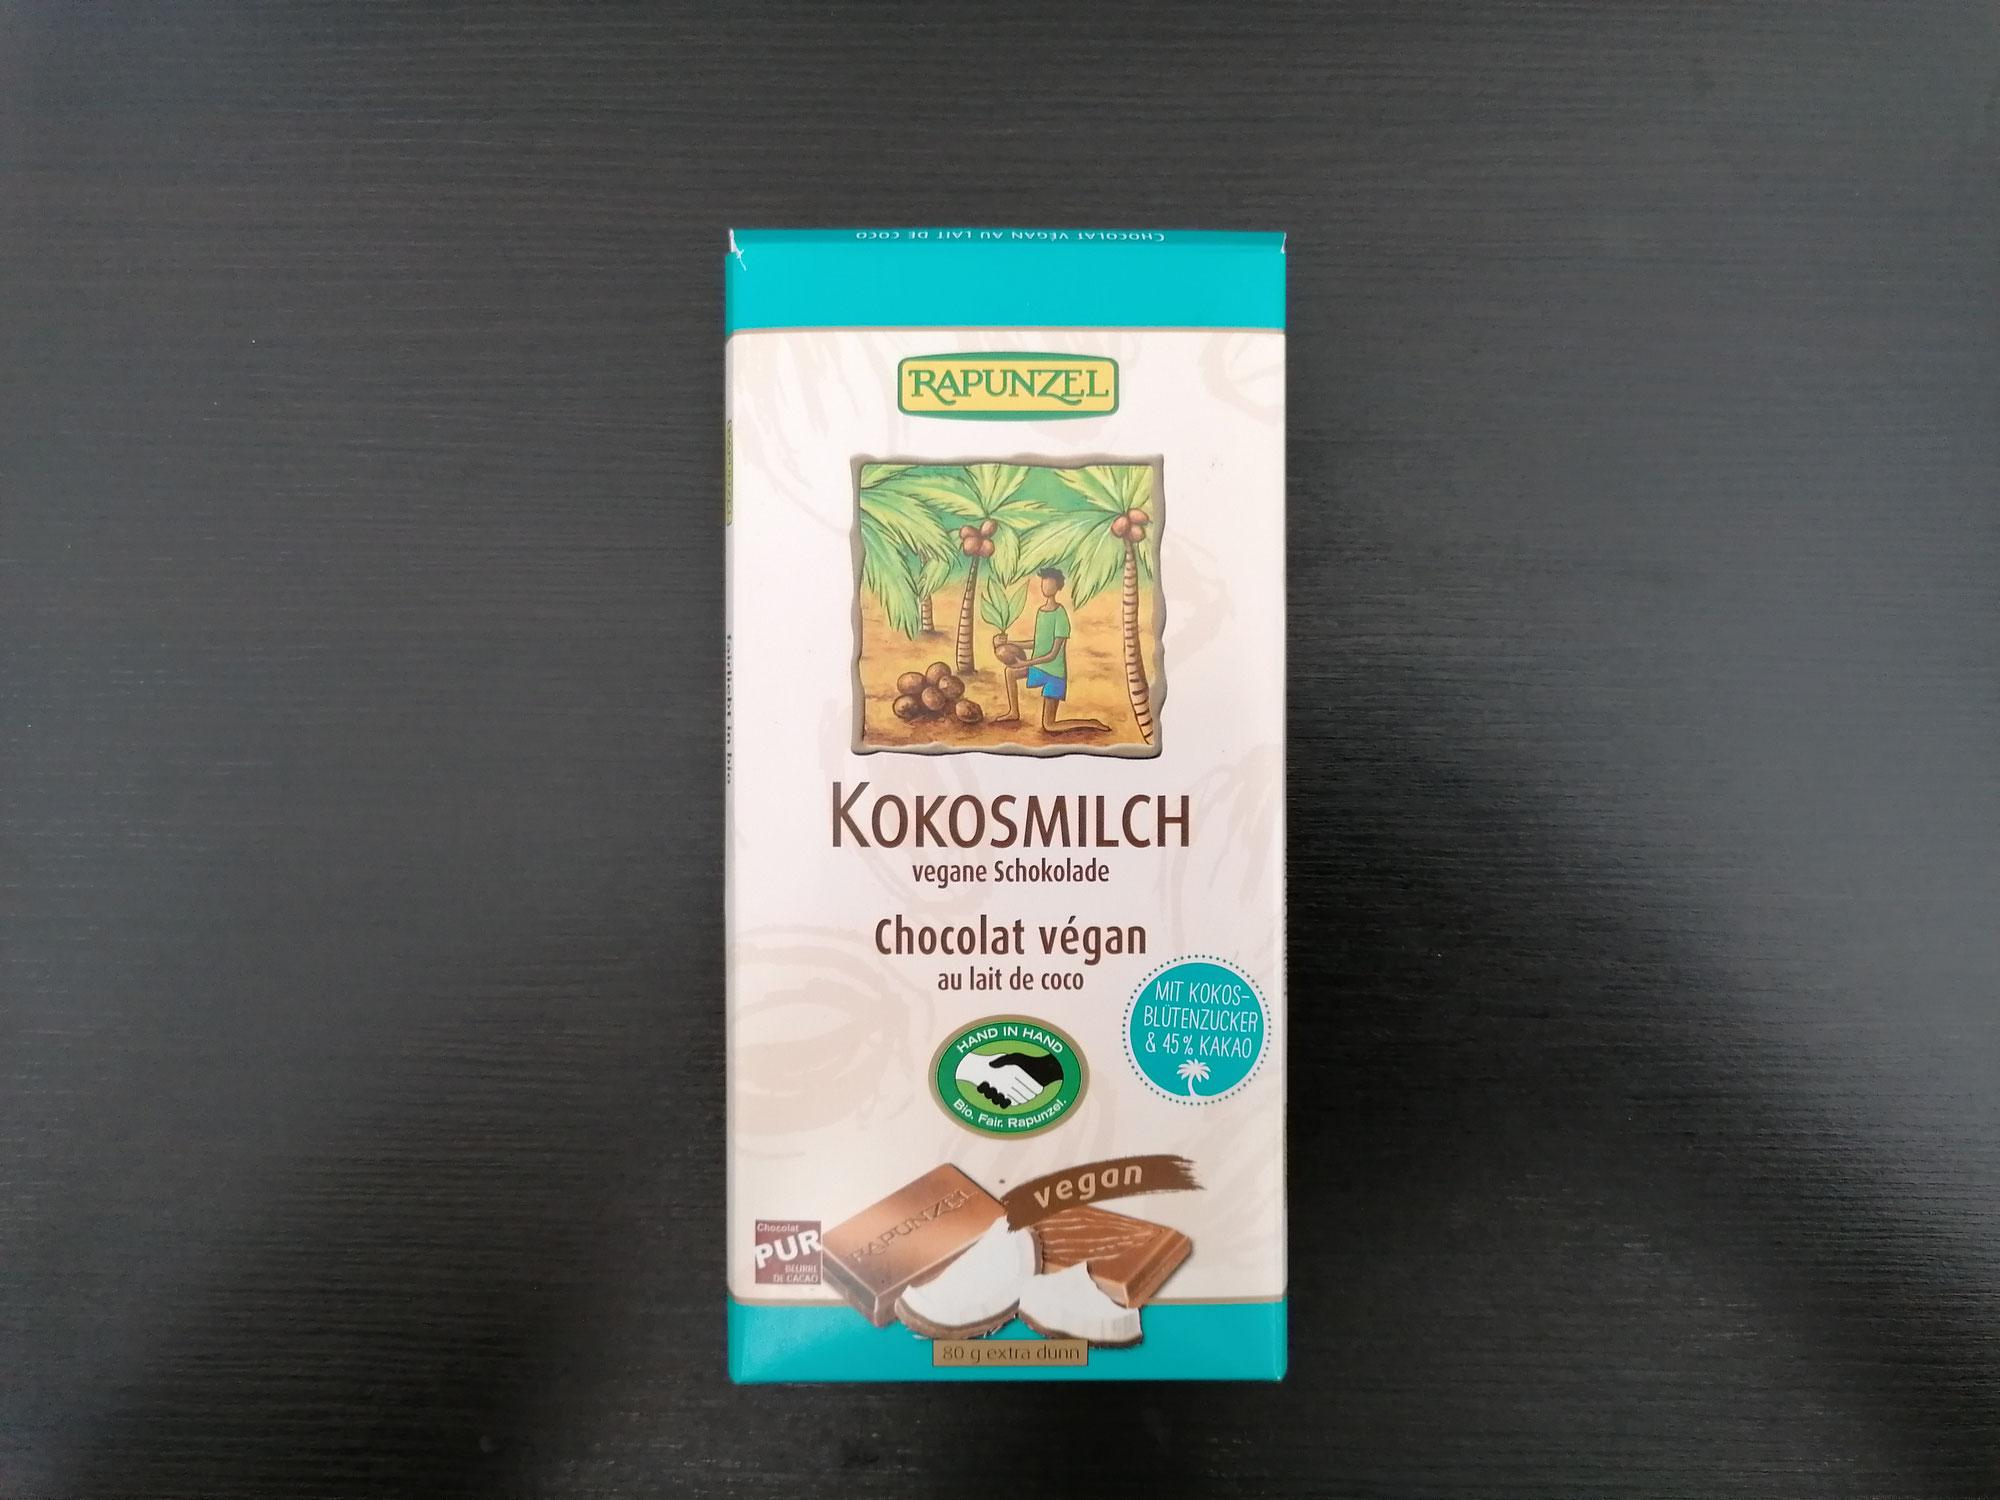 Rapunzel Kokosmilch vegan